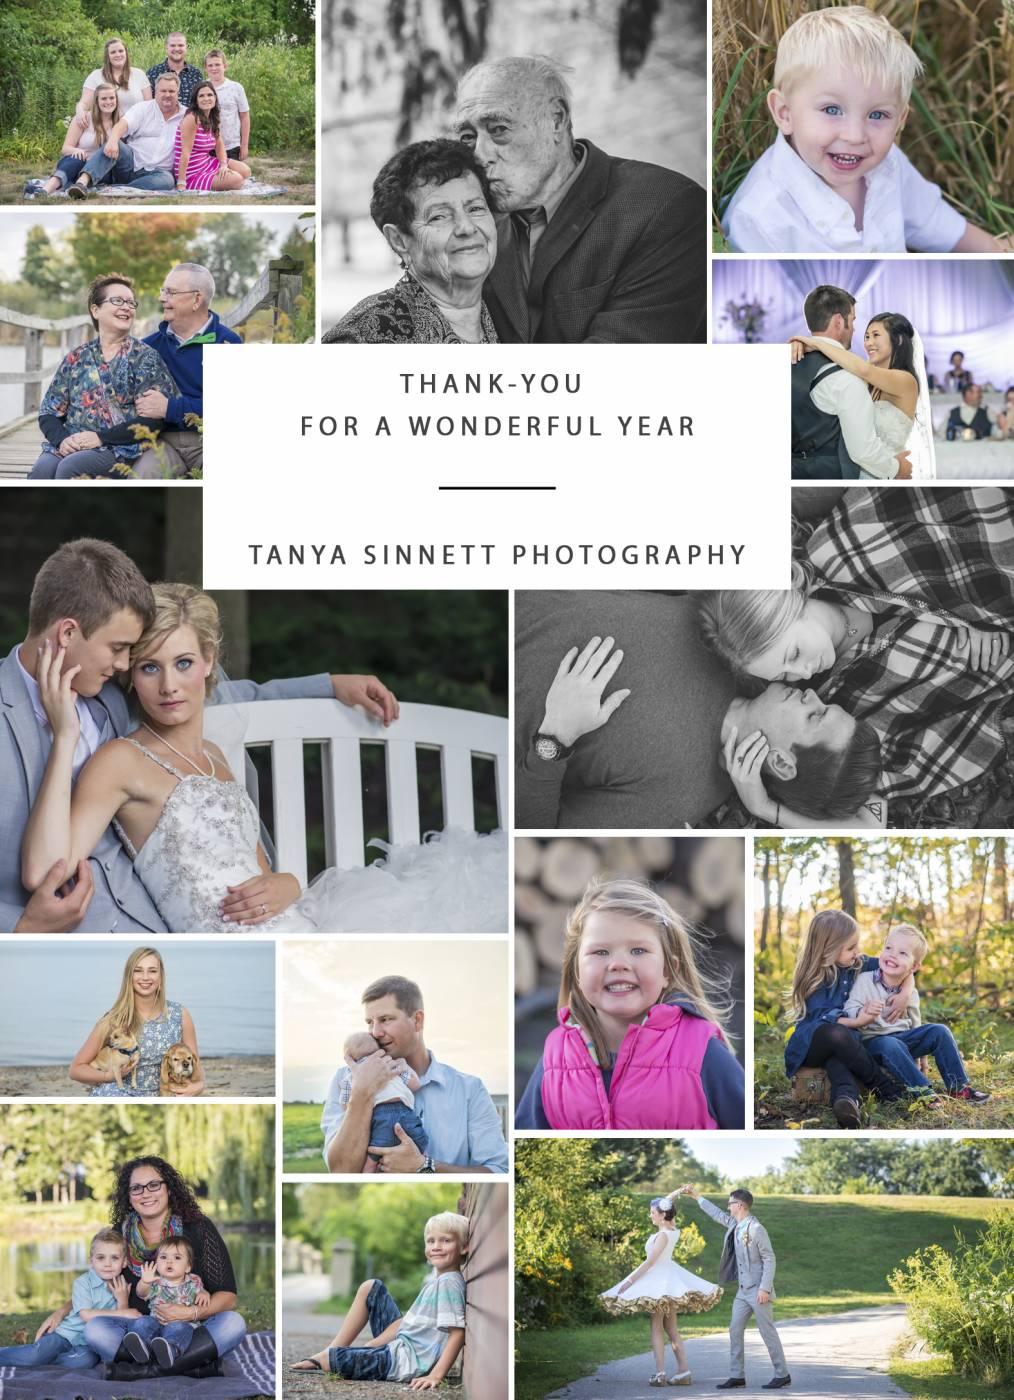 ThankYou from Tanya Sinnett